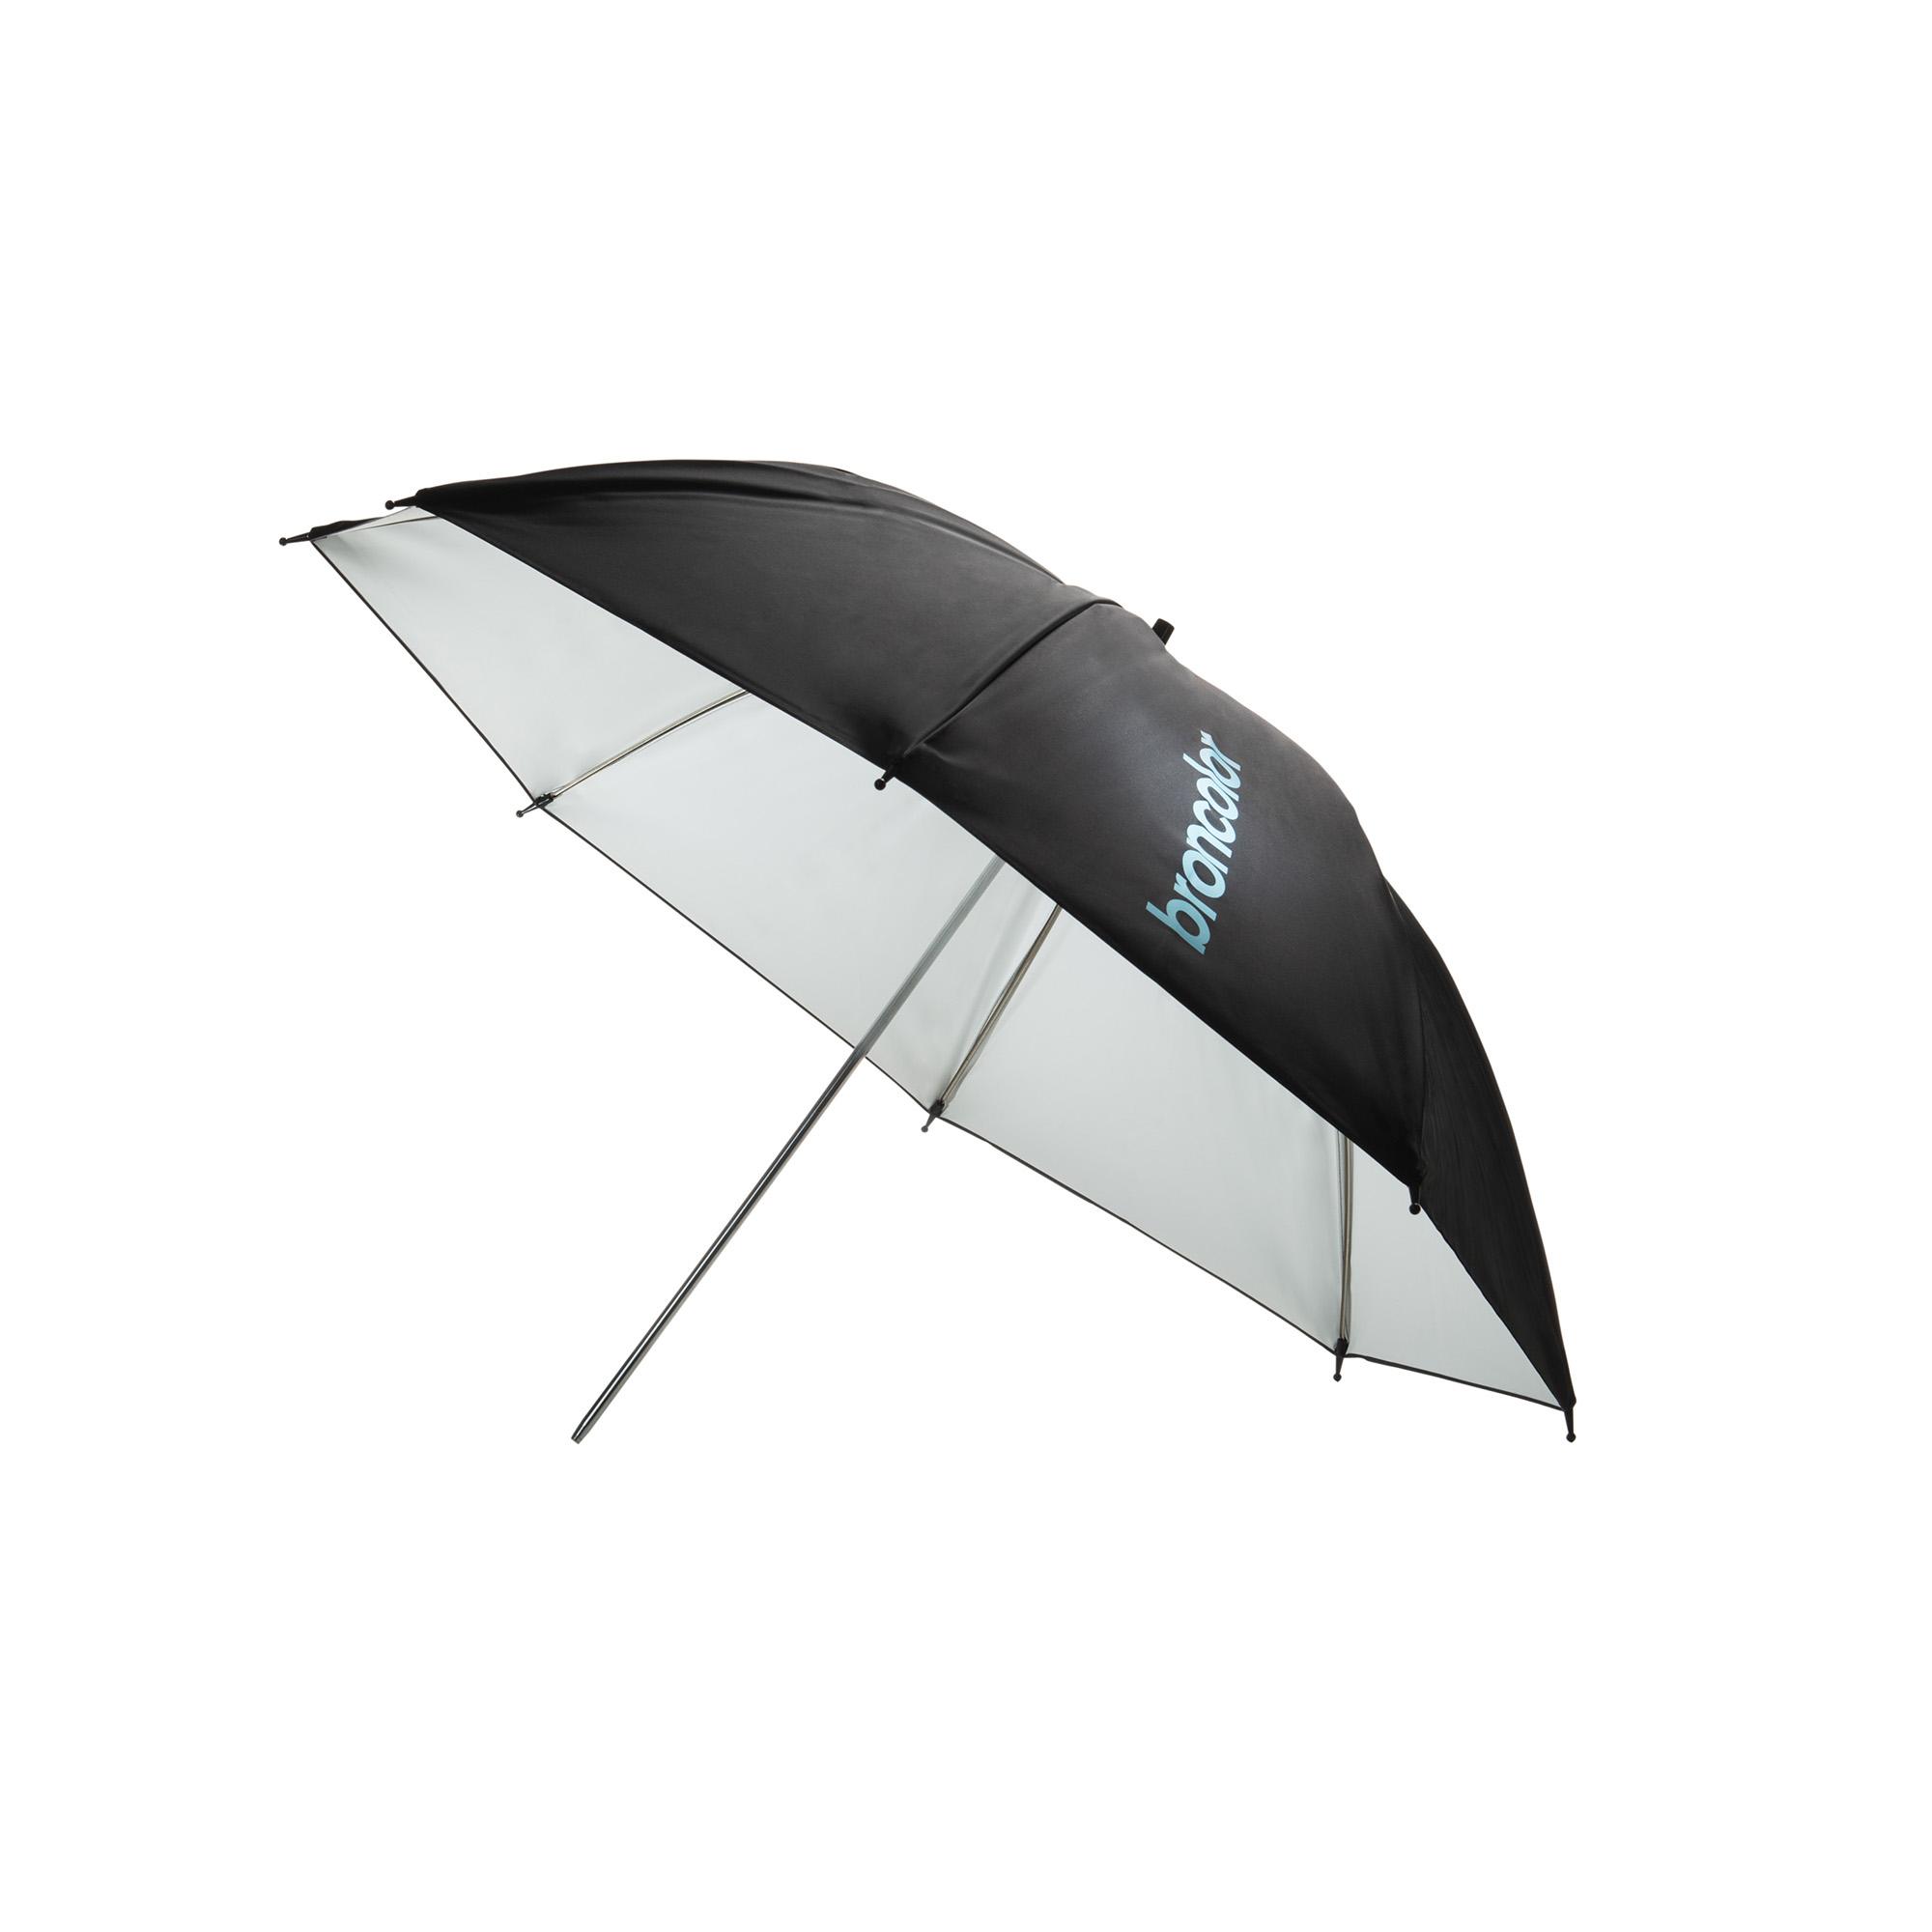 Broncolor Umbrella white 105 cm available to rent / verhuur / location at 50.8 Studio • Belgïe, Belgique, Belgium, Broncolor, Huur, Location, Louer, Photo, Rent, Rental, Softbox, Strobe, Studio, Verhuur, Video